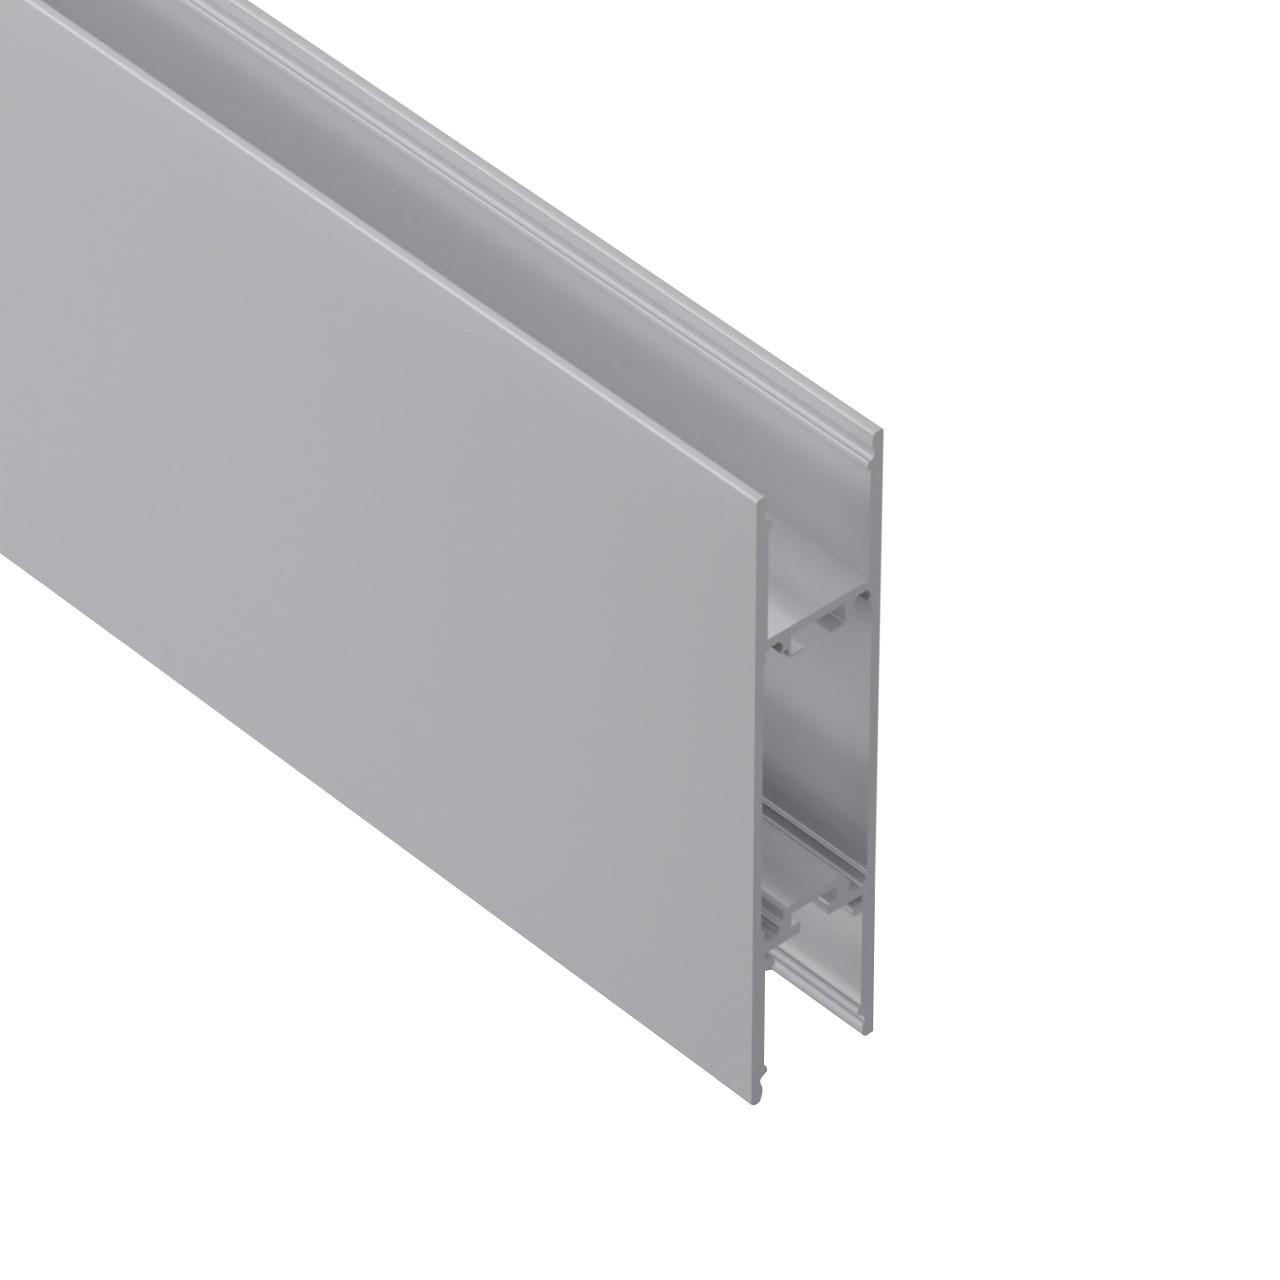 P24 Surface/ pendant H led profile 25x120mm